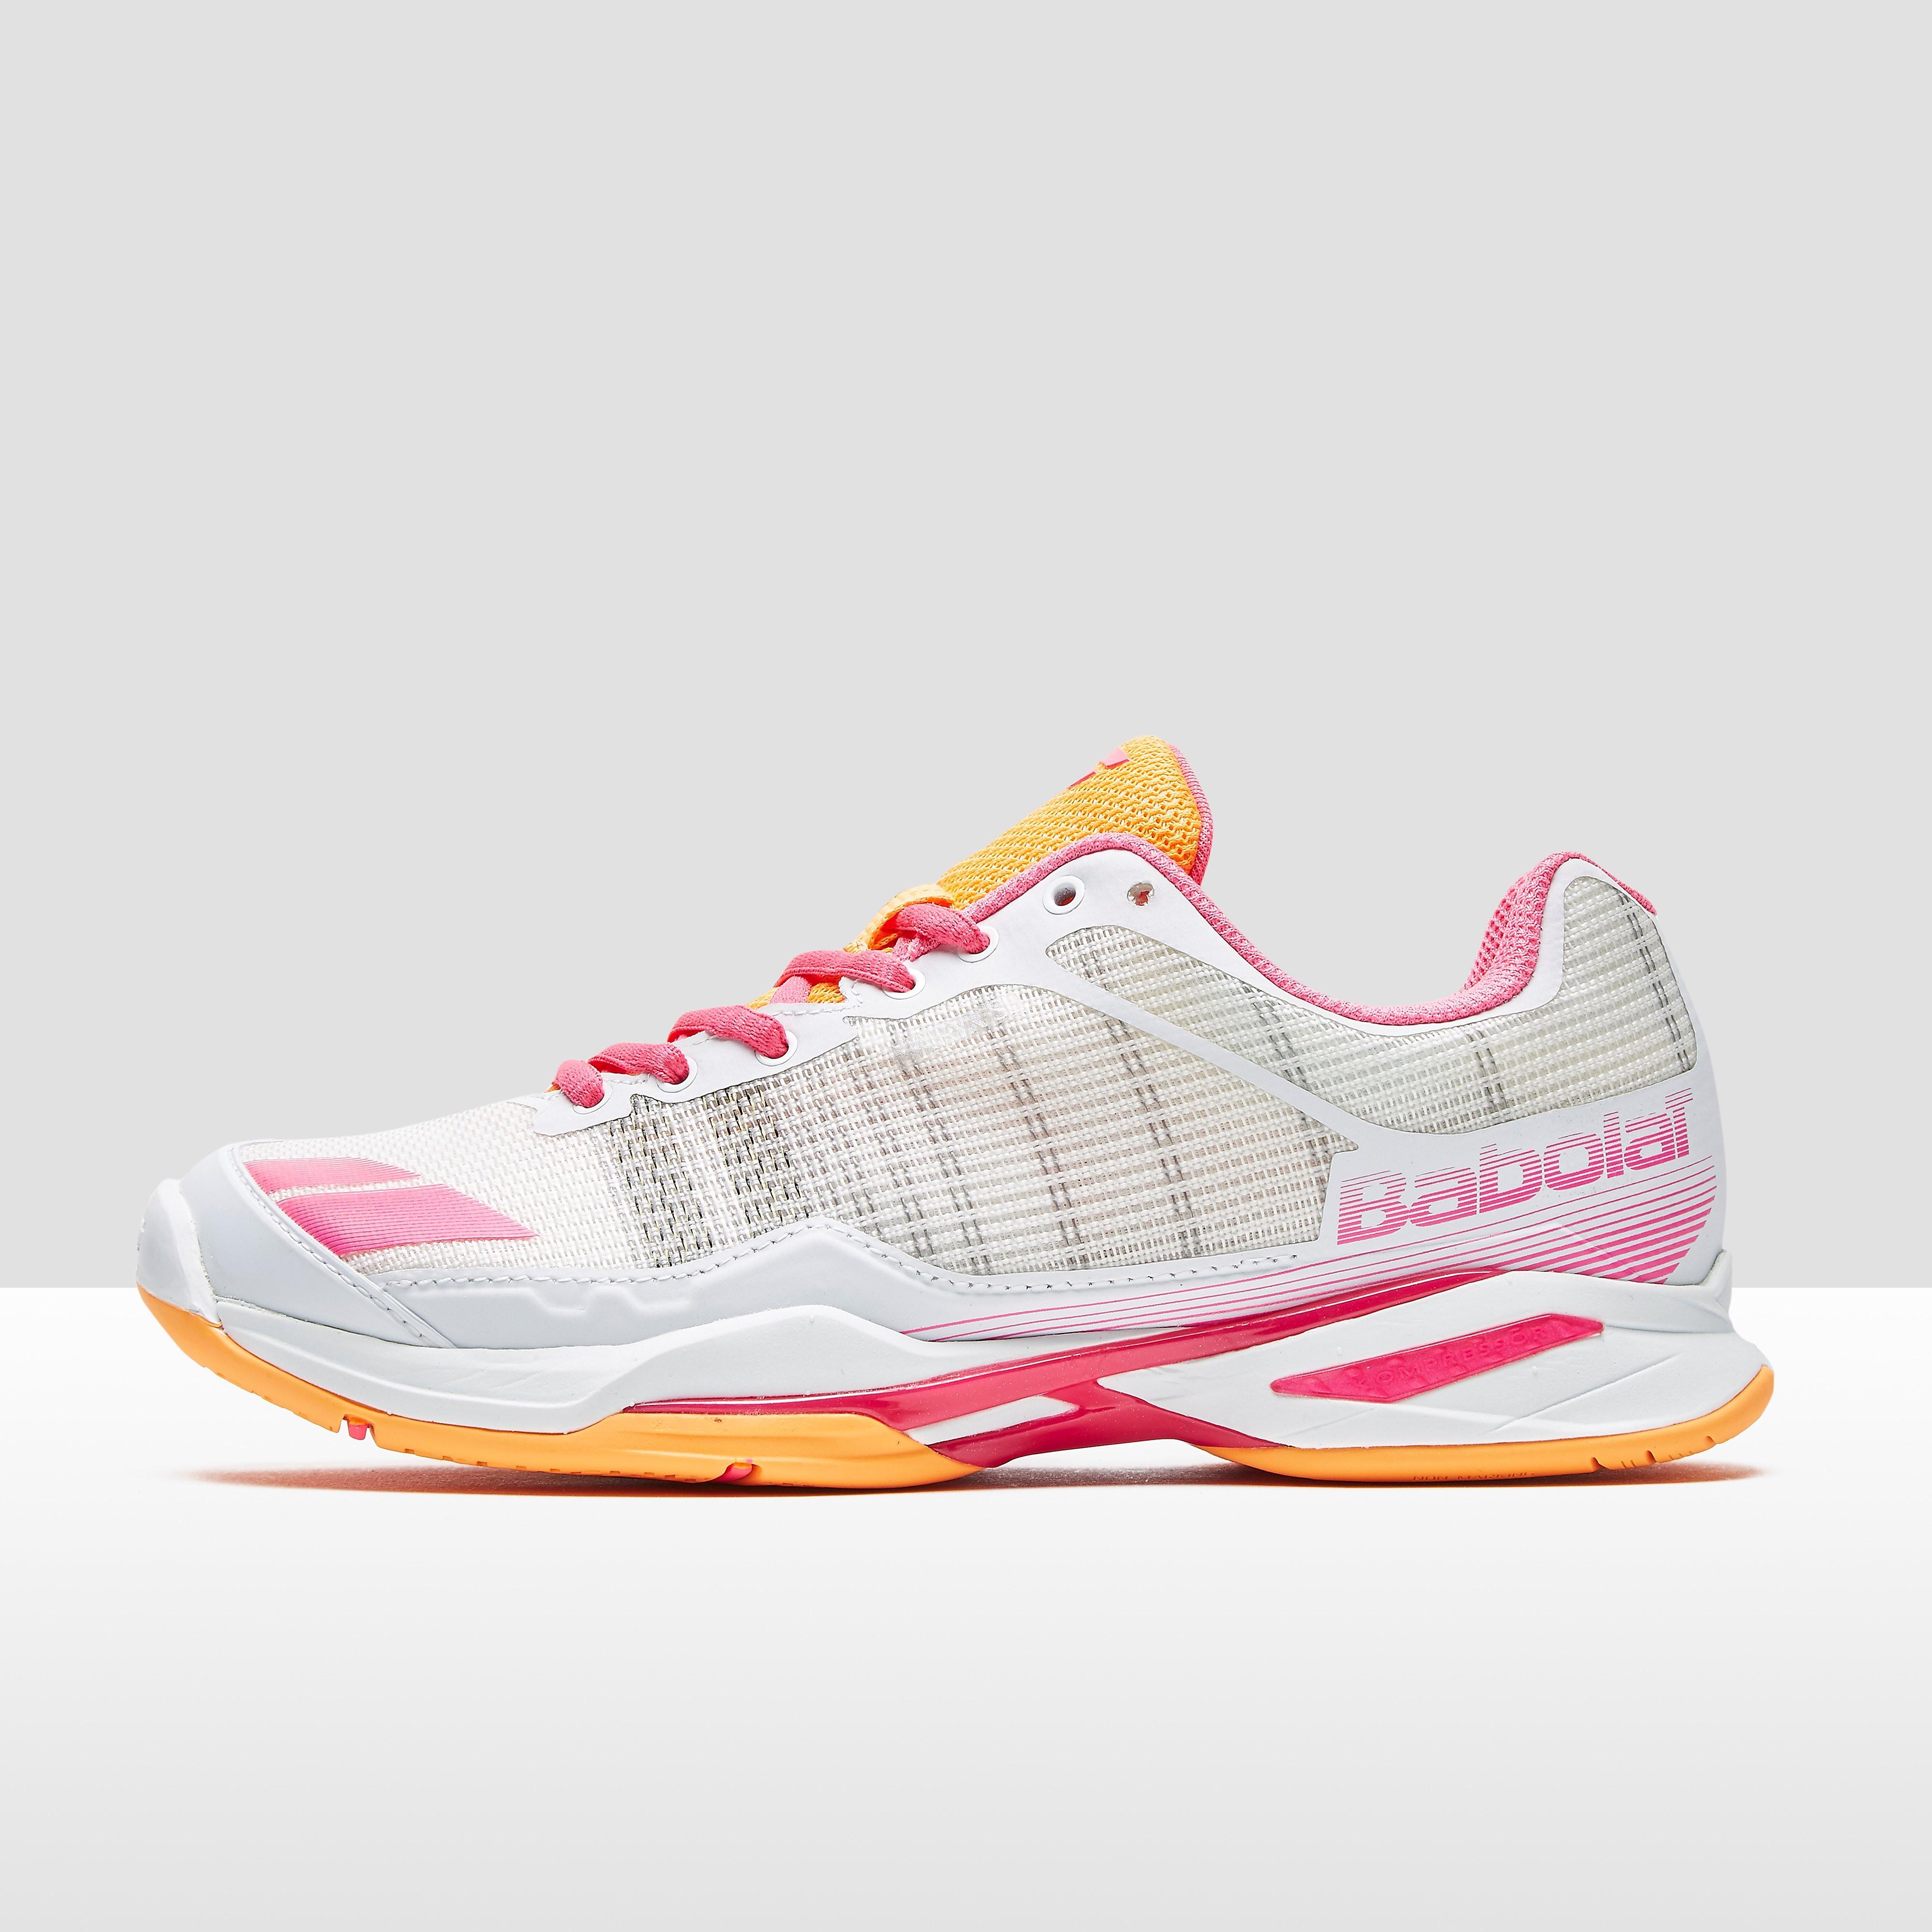 Babolat Jet Team All Court Women's Tennis Shoes